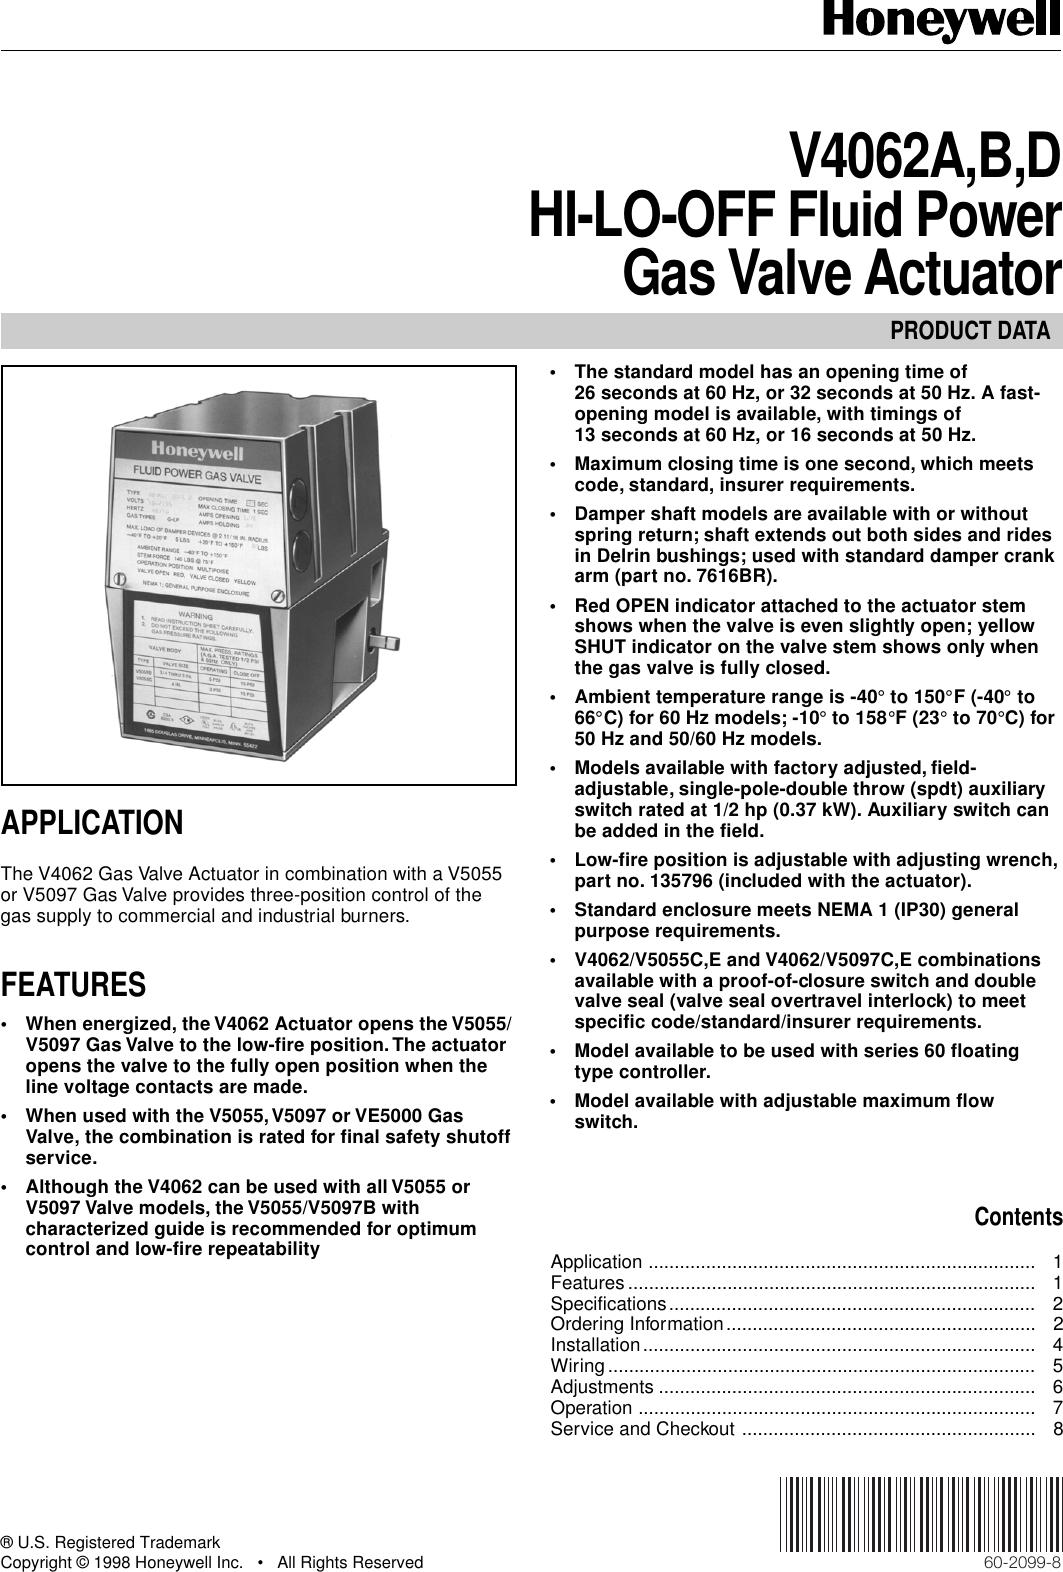 Honeywell Thermostat V4062B Users Manual 60 2099 V4062A,B